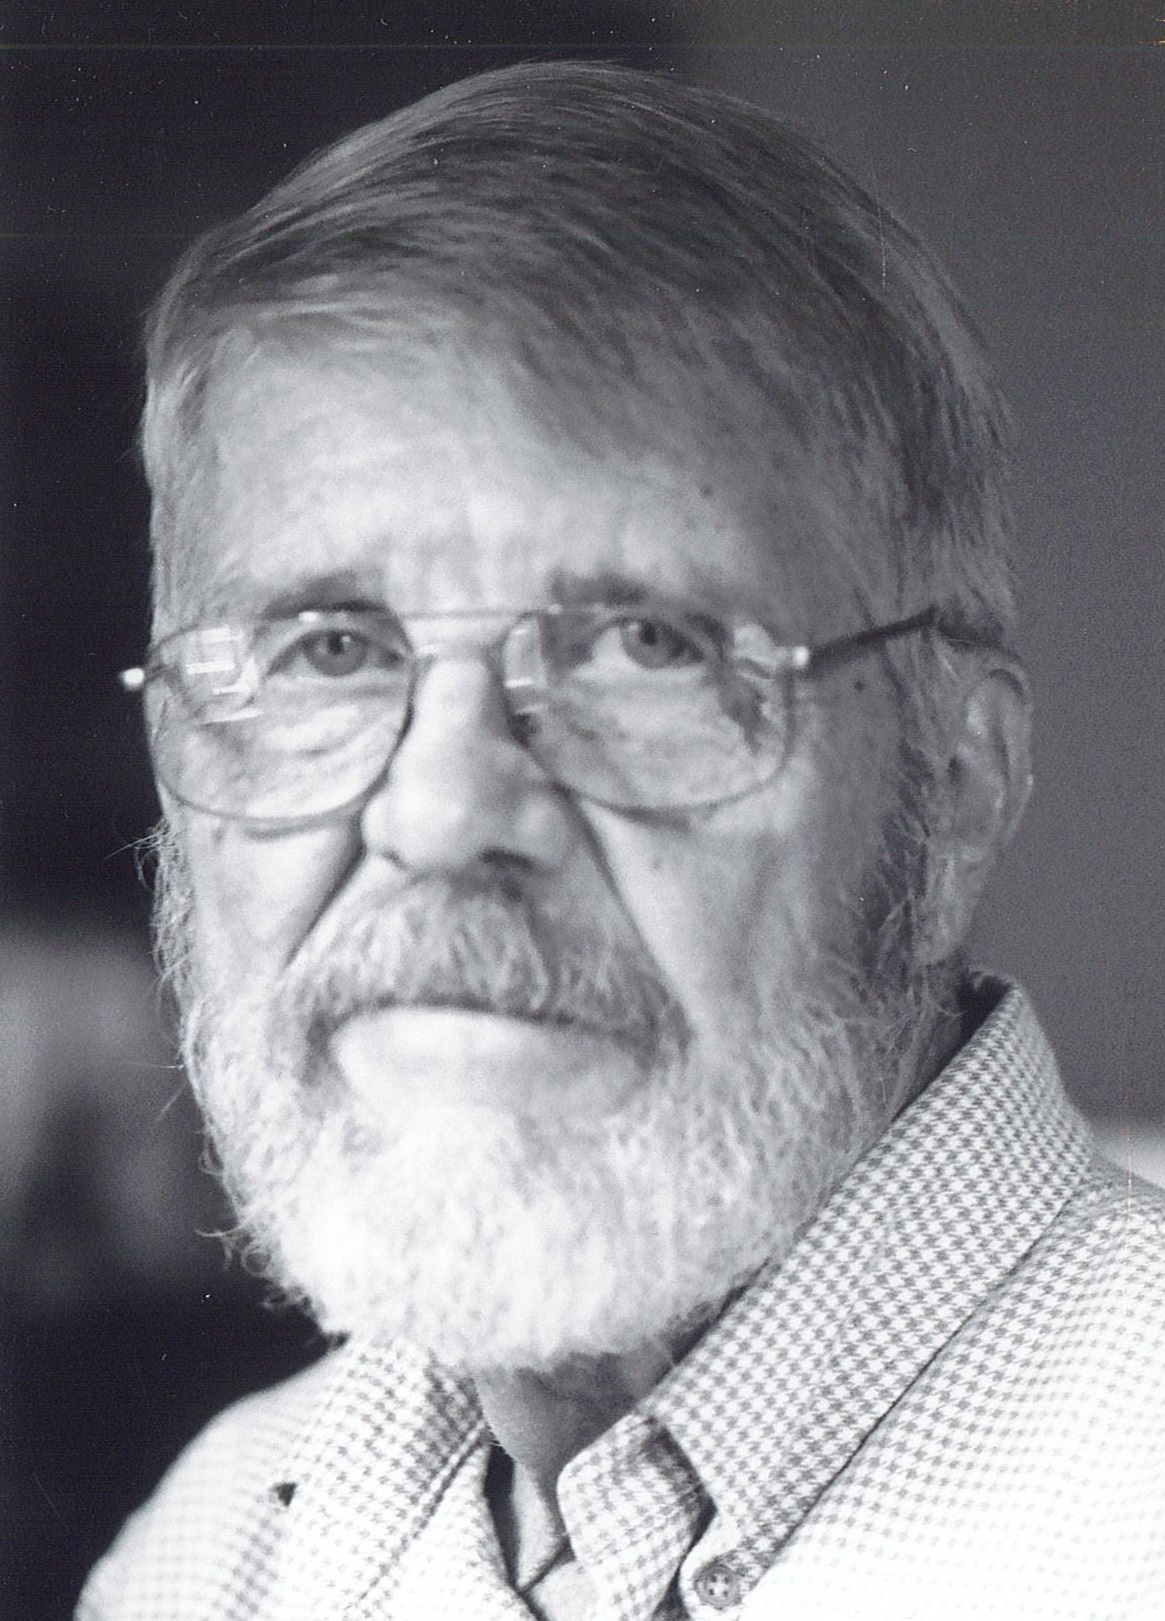 James E. Brasted